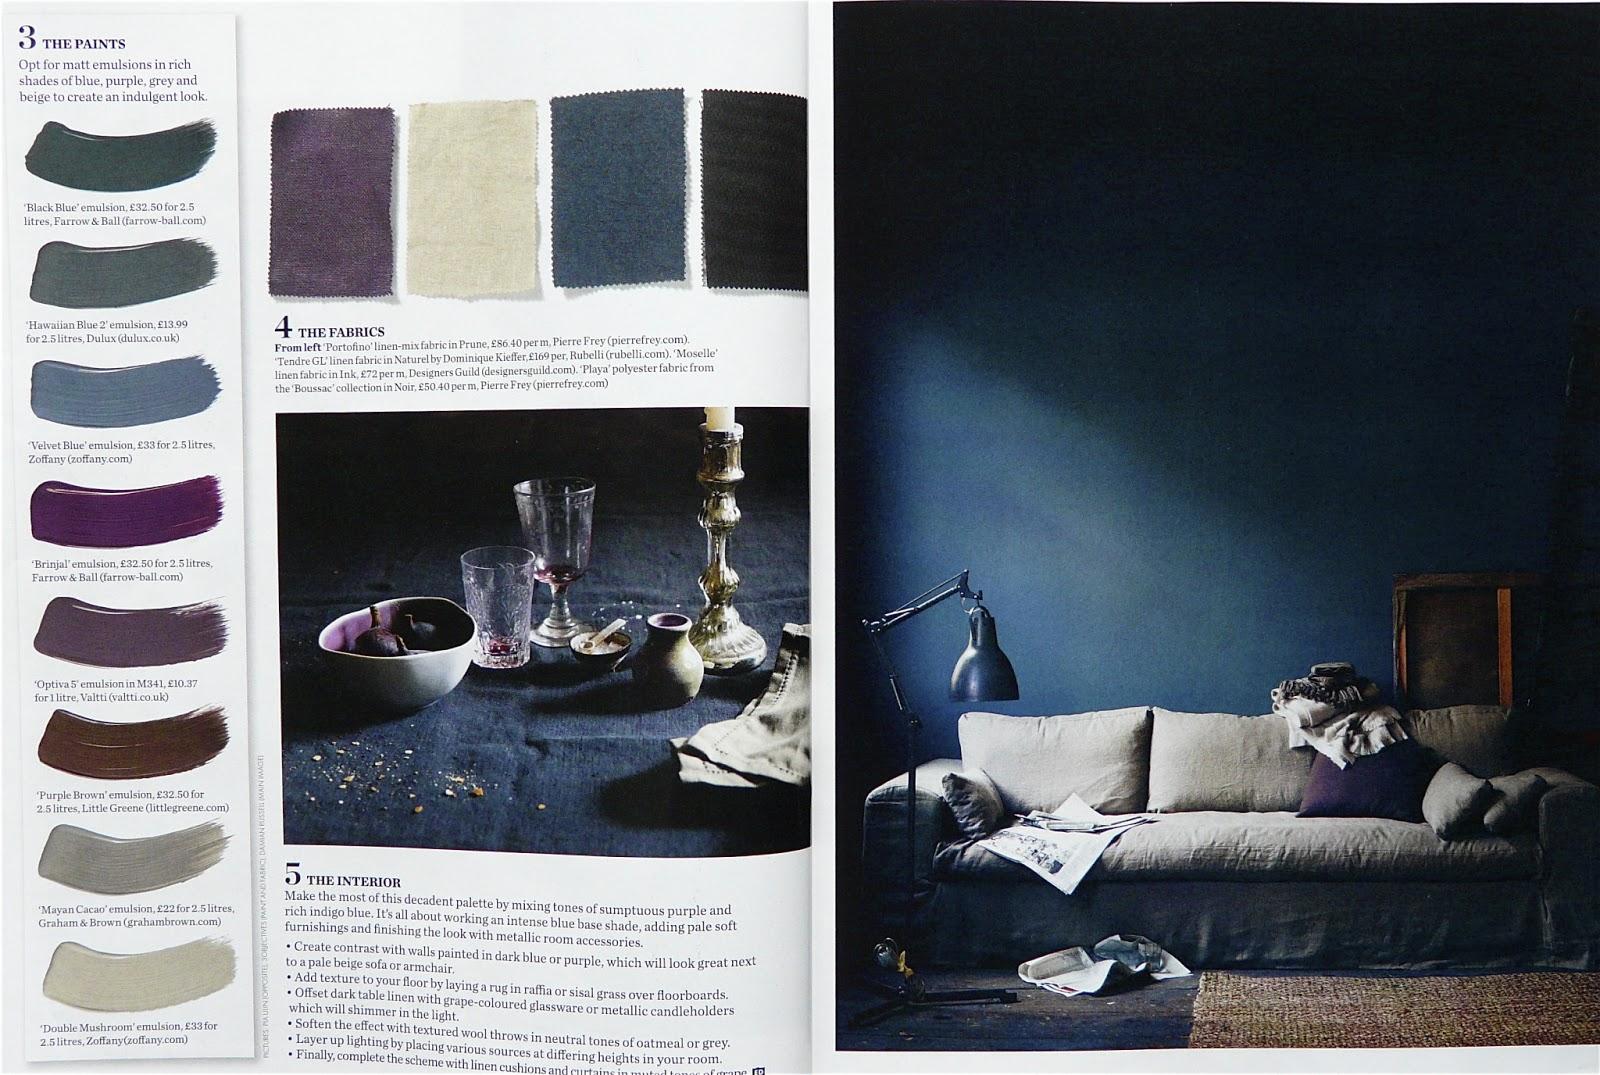 marque de peinture anglaise farrow and ball toutes les peintures with marque de peinture. Black Bedroom Furniture Sets. Home Design Ideas